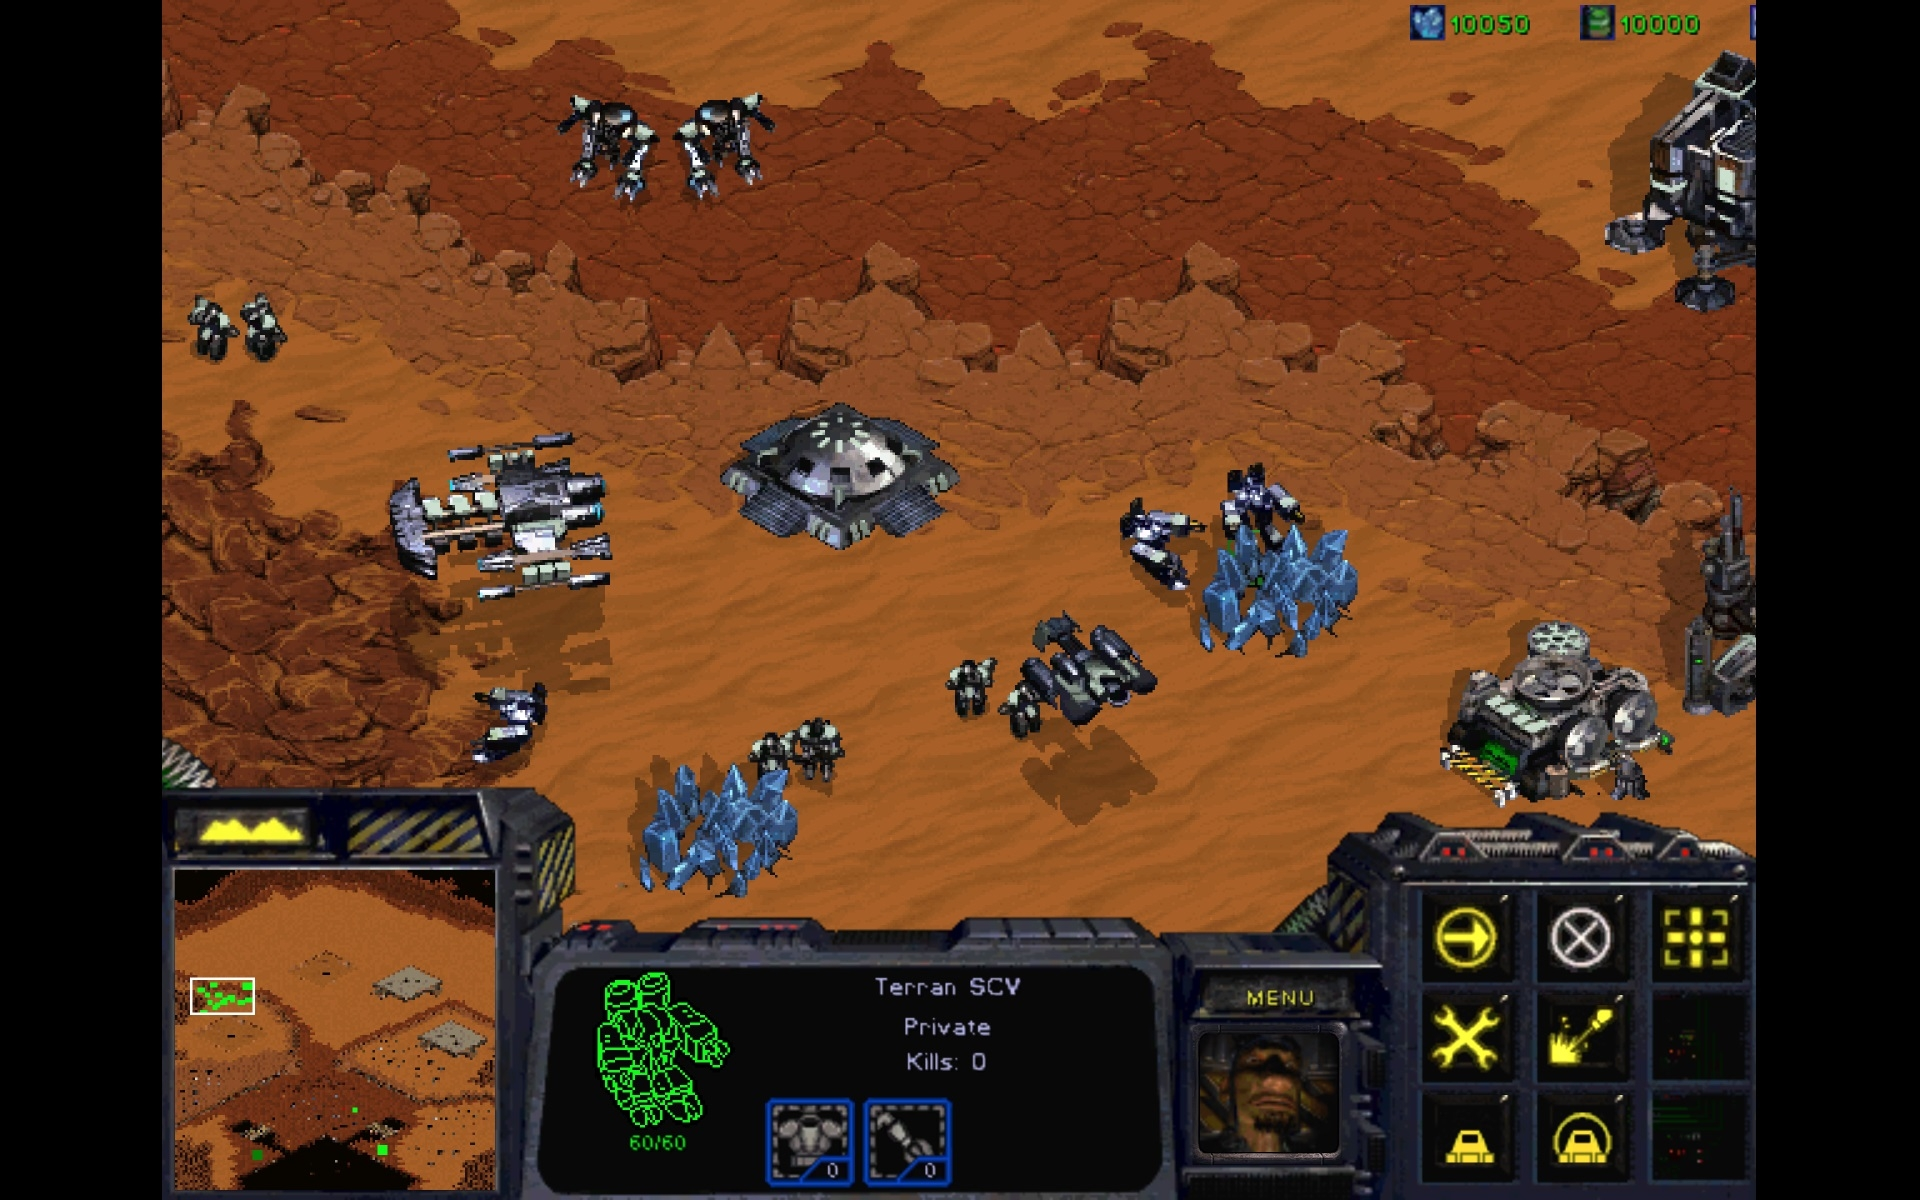 Starcraft Remastered - Terra Old